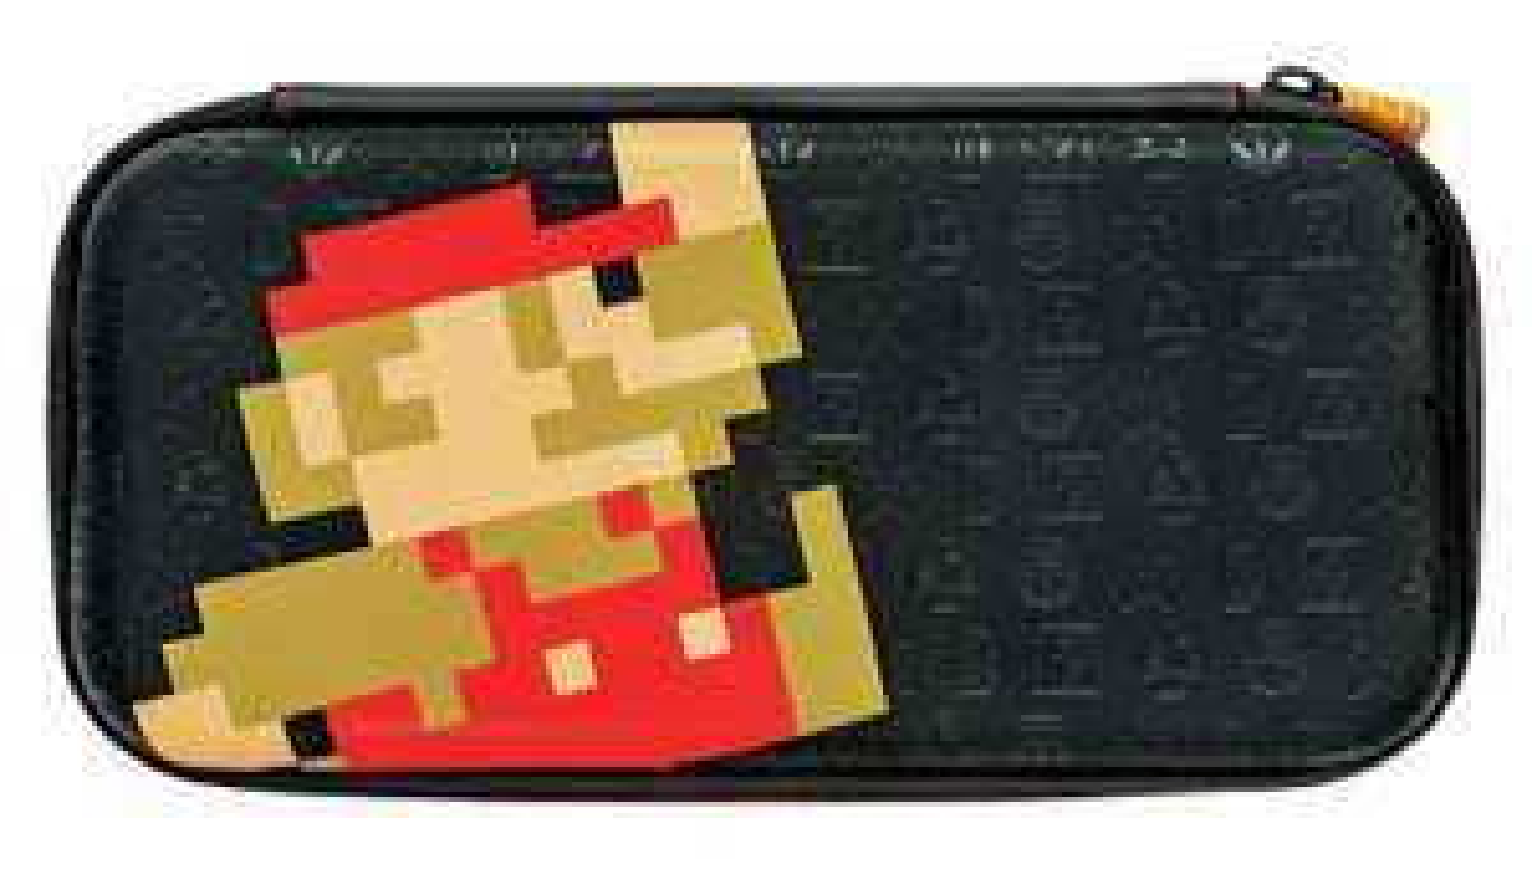 PDP Nintendo Switch Slim Travel Case - Retro Mario Edition for £4.99 (+£3.95 delivery) @ Argos